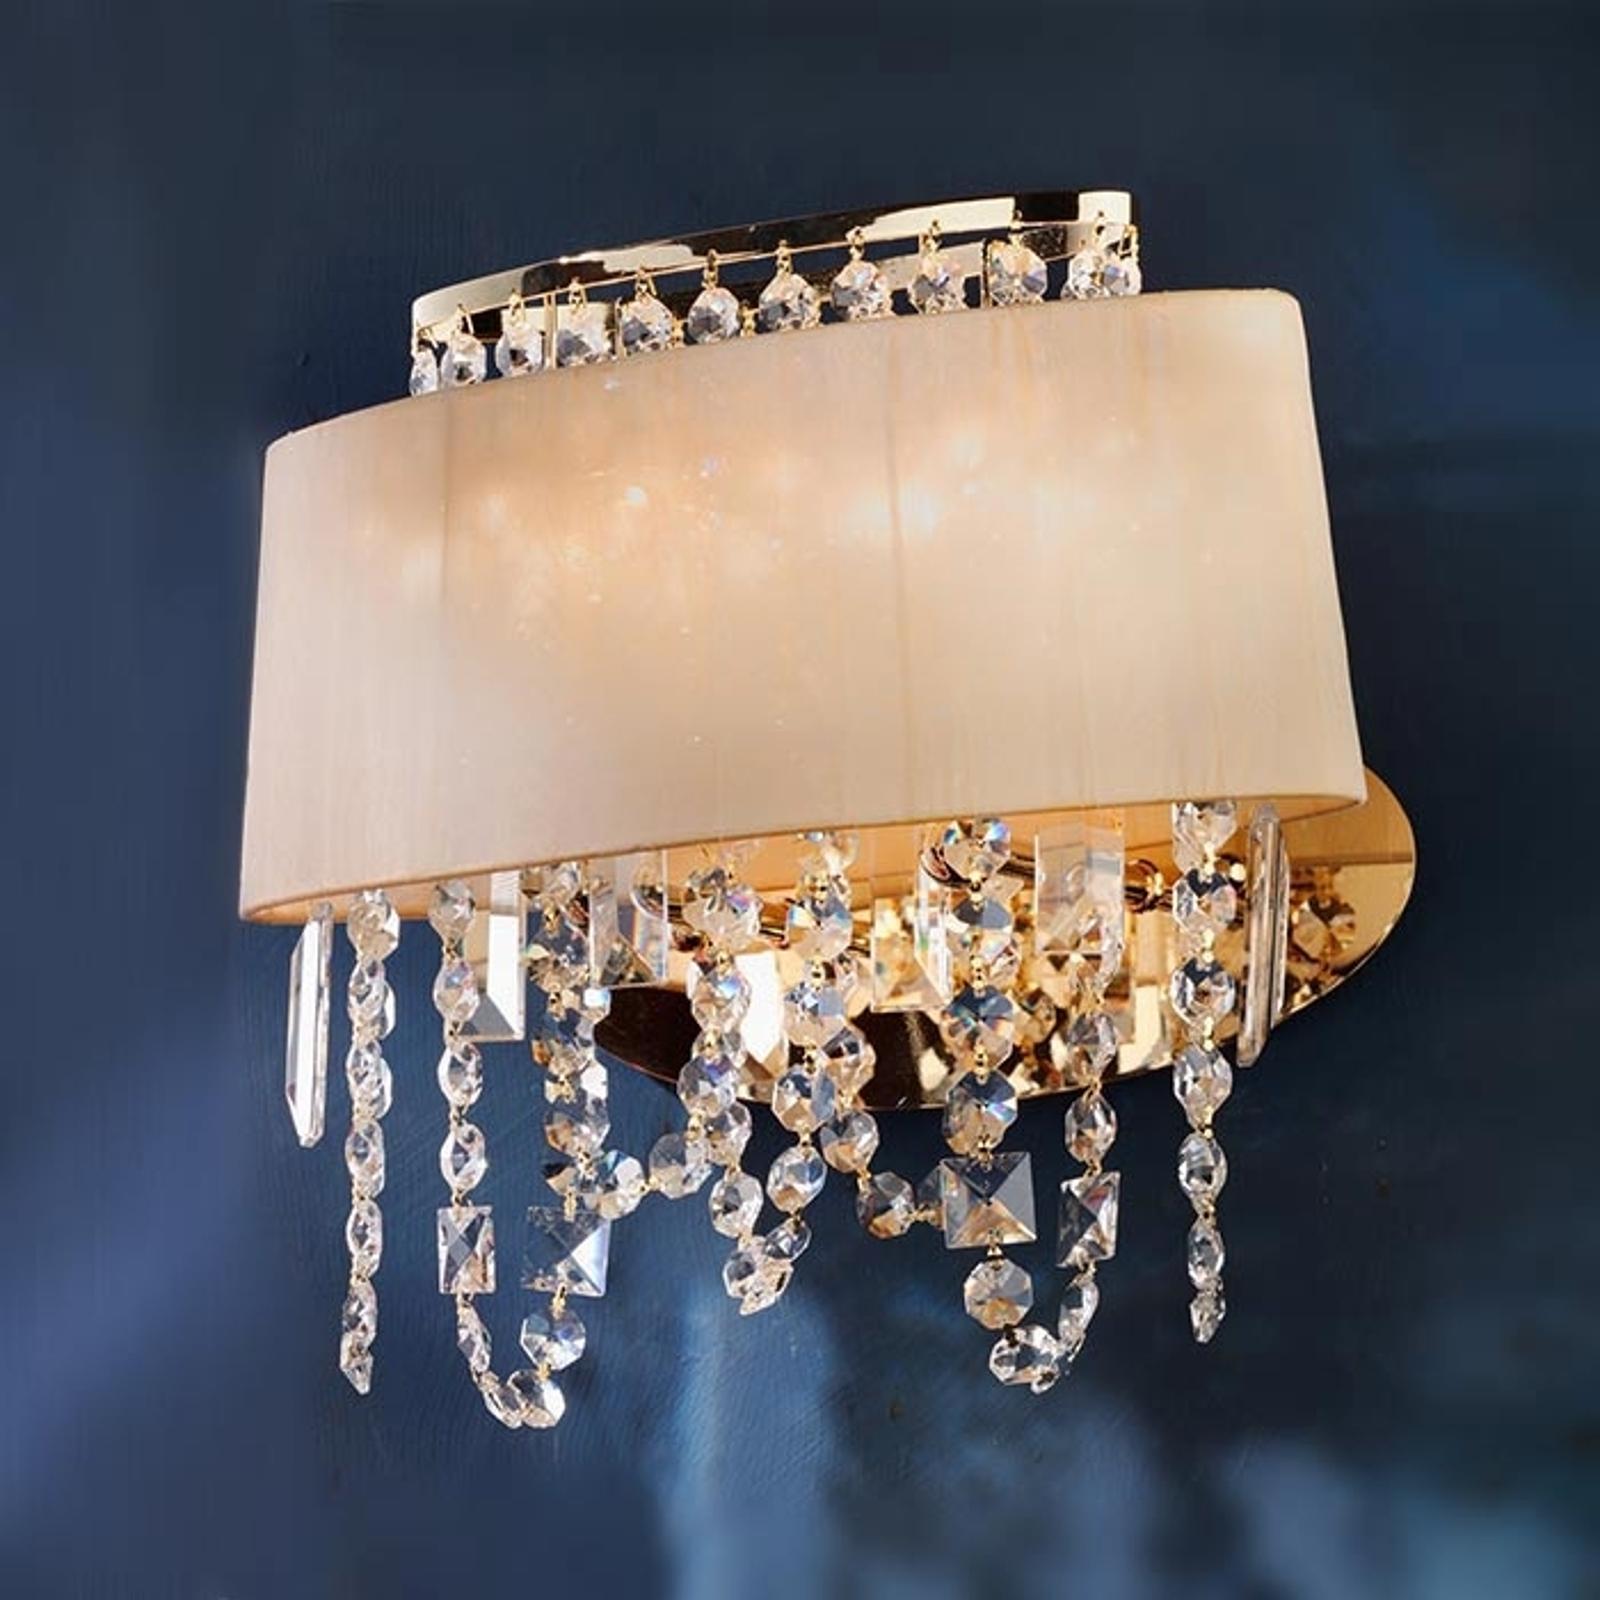 Ravissante applique Jevana pendentif cristal